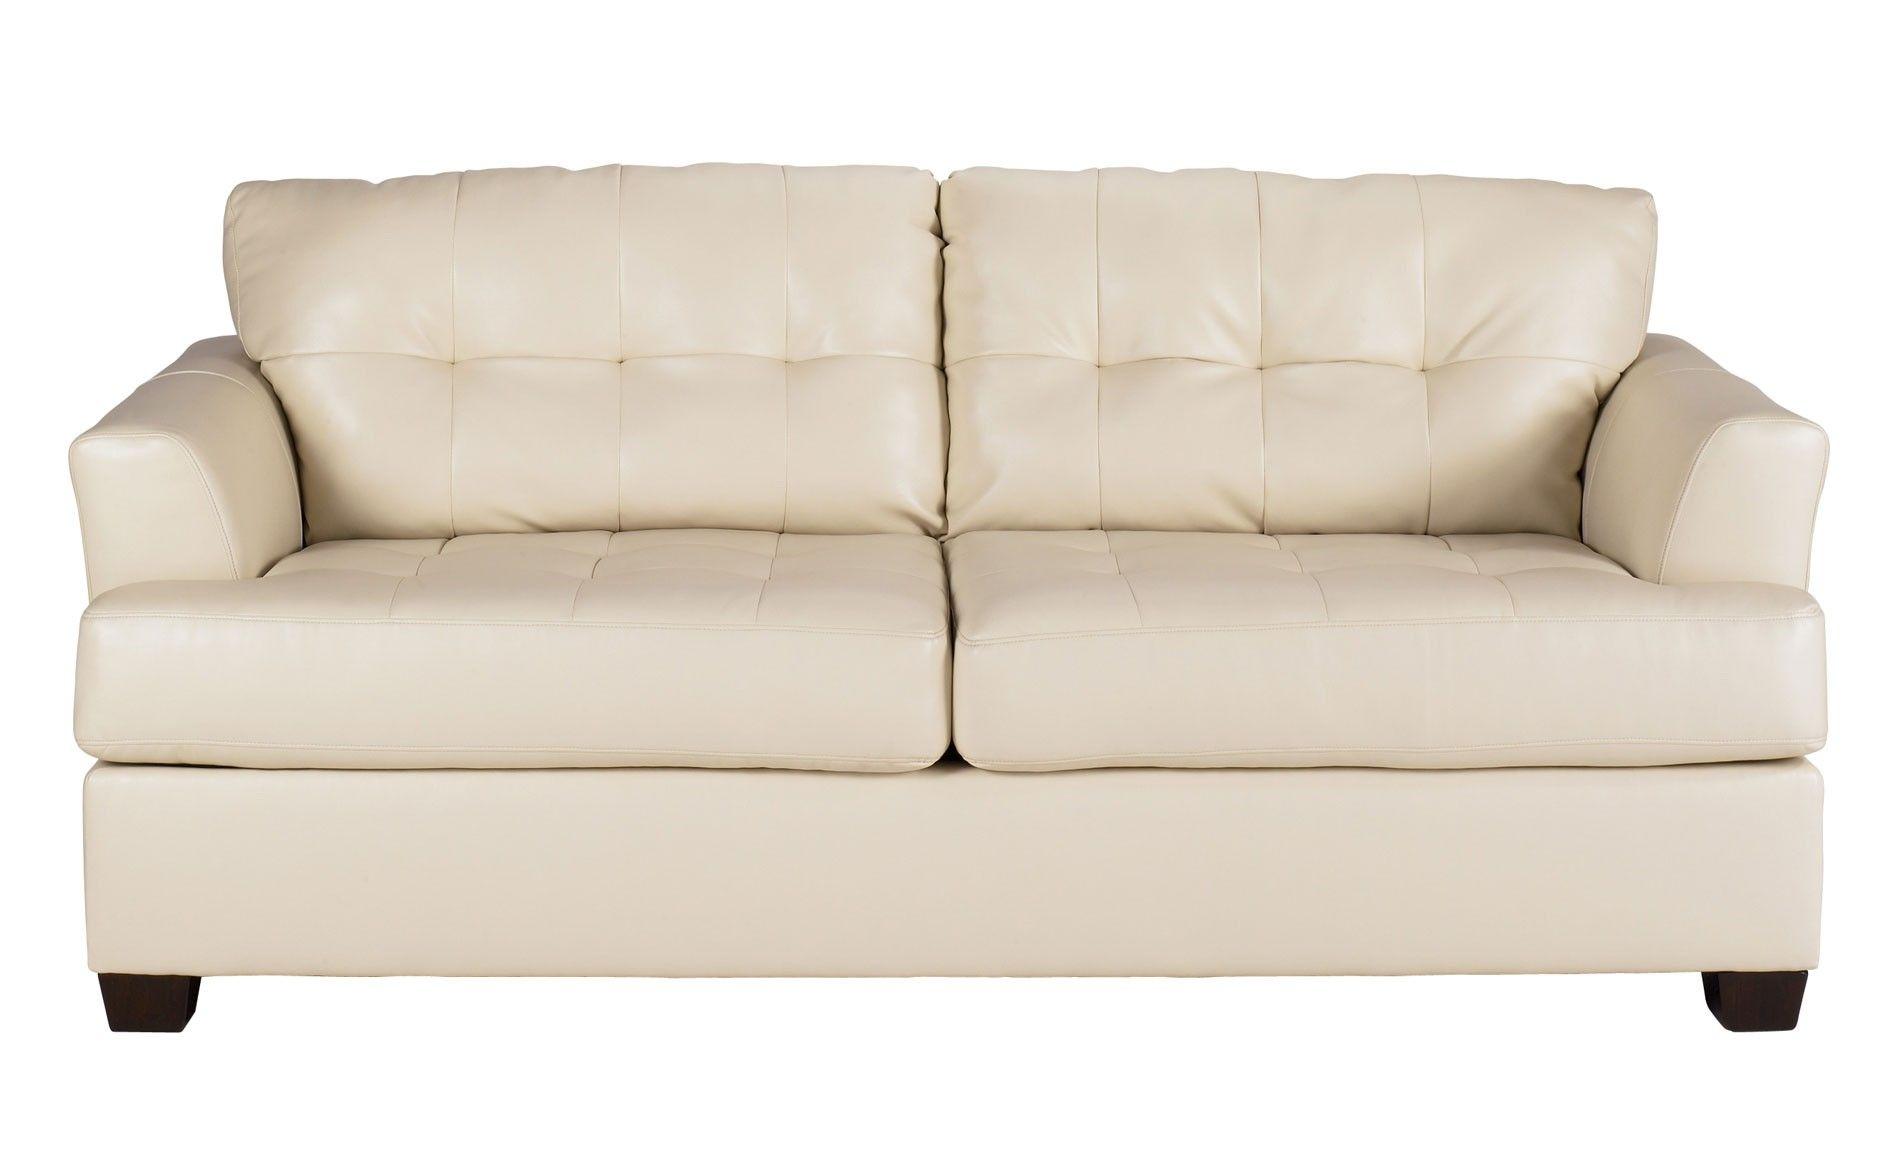 Queen size leather sleeper sofas tmidb pinterest